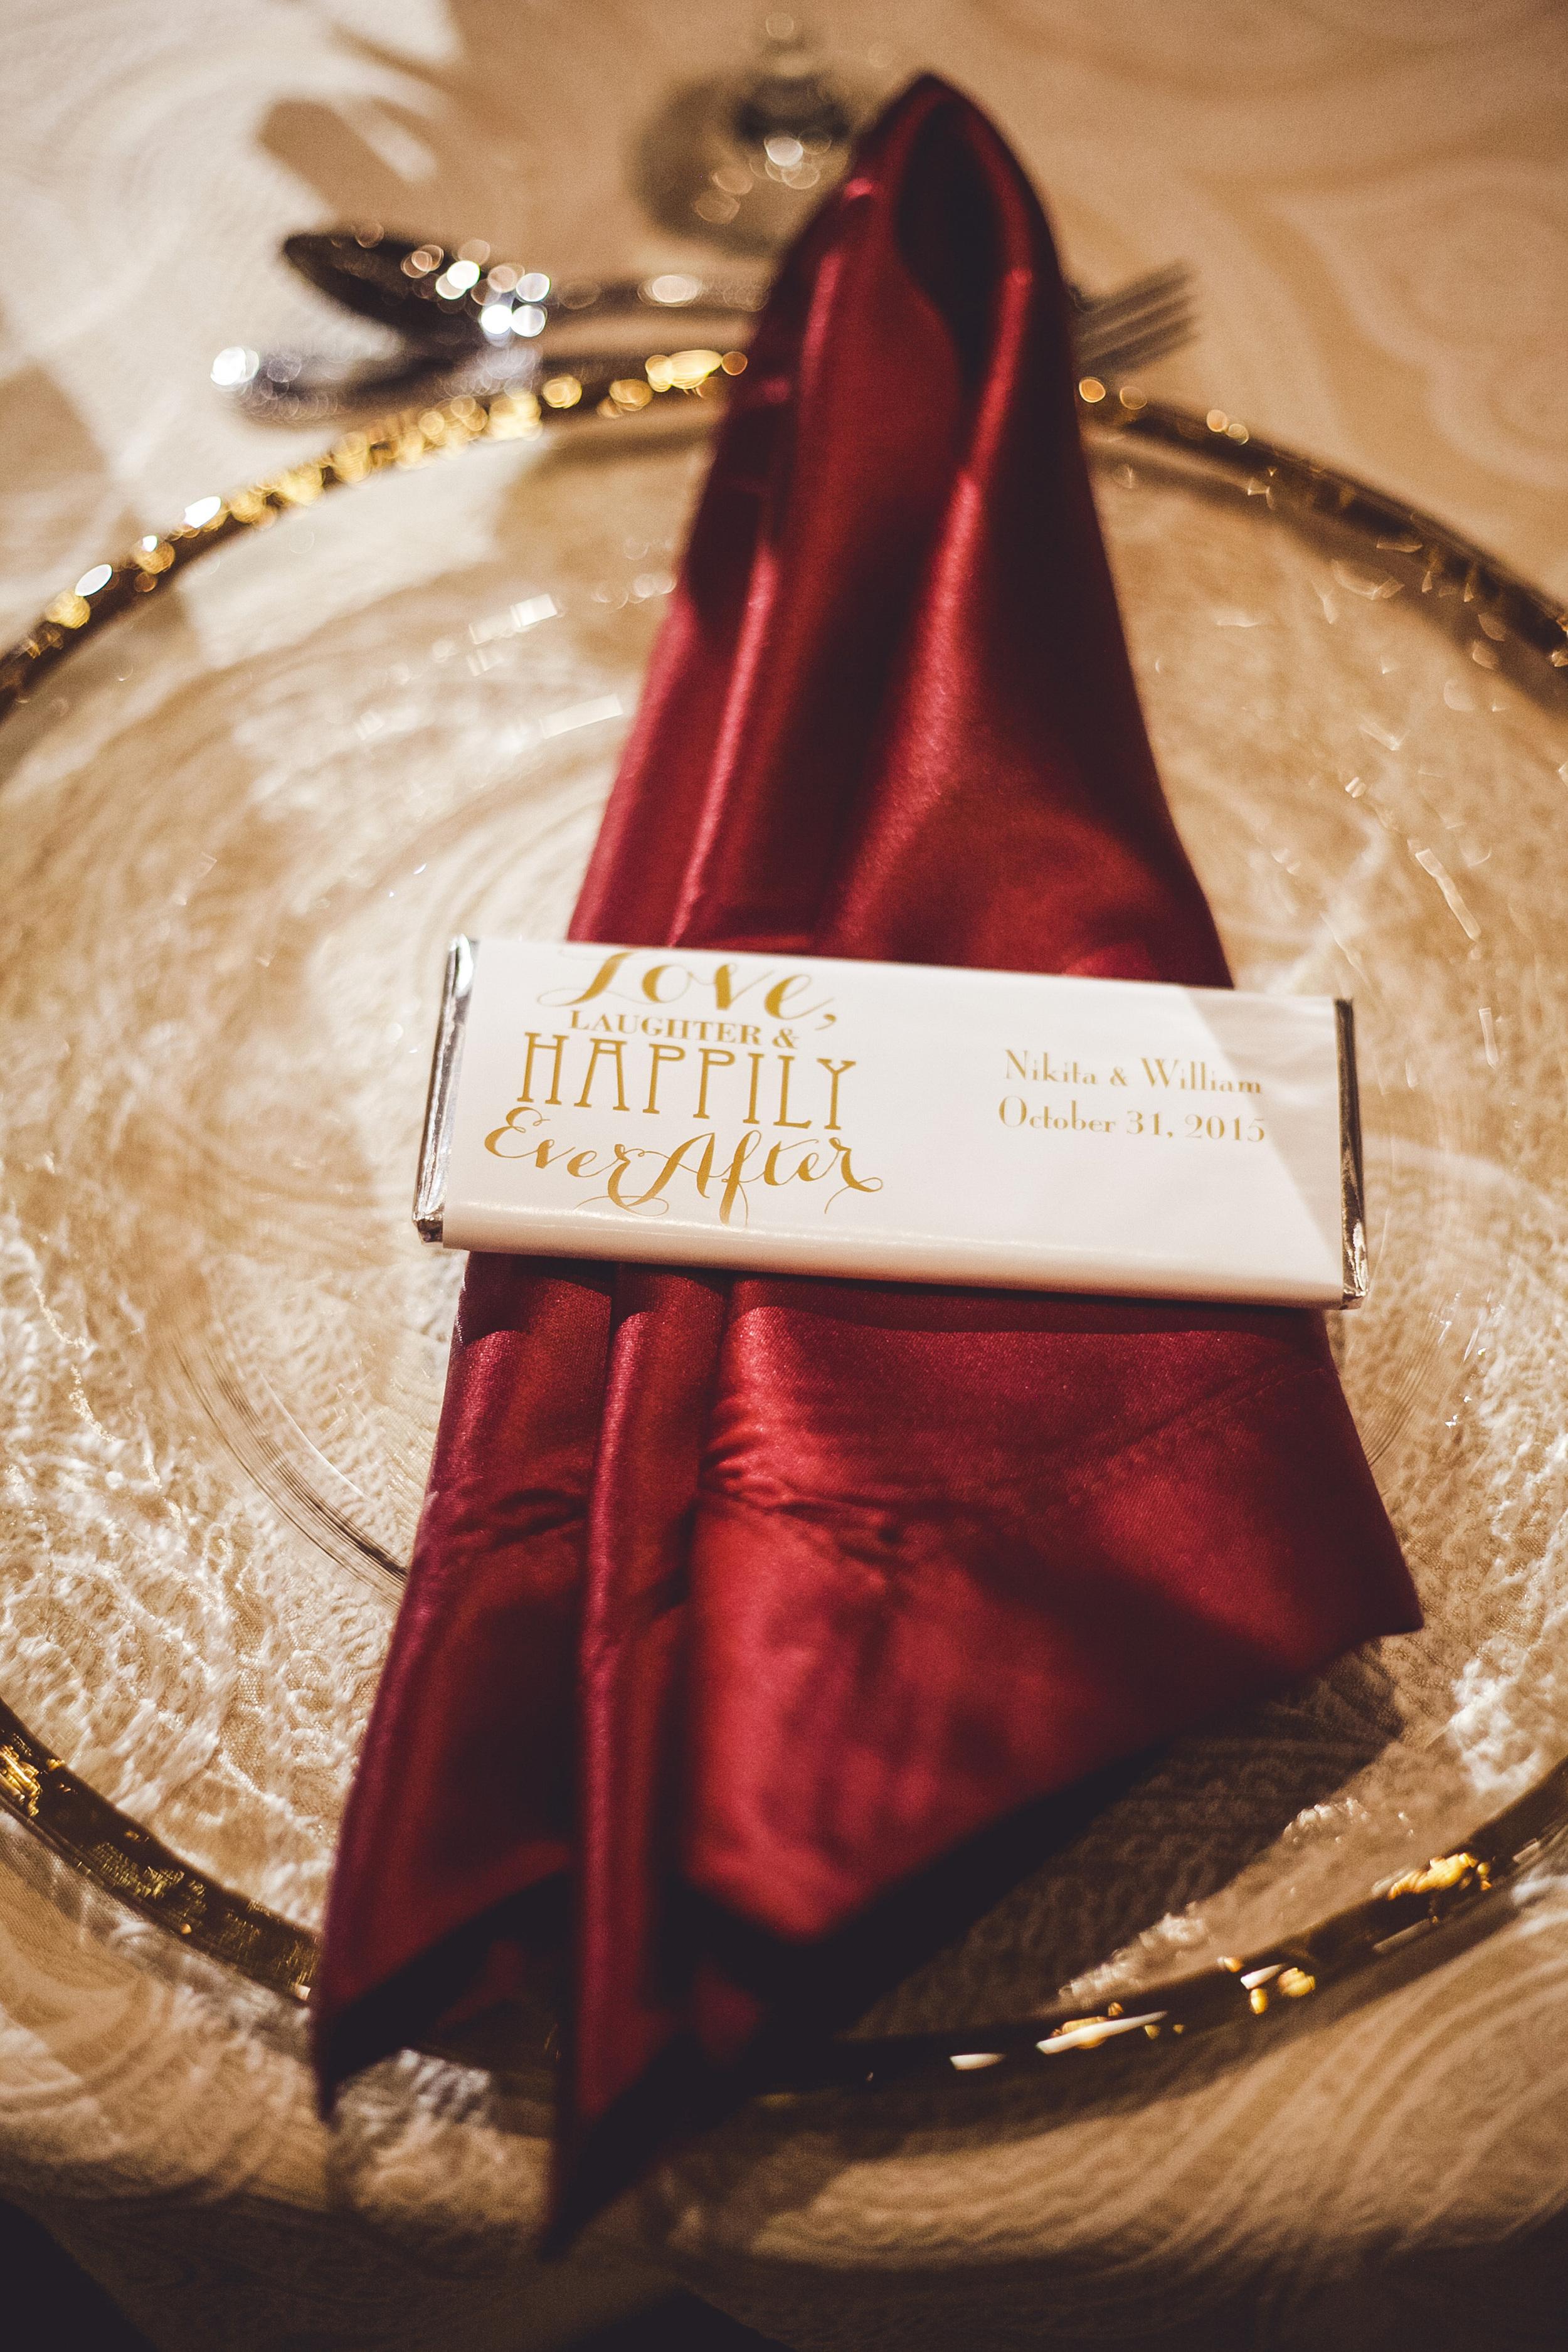 arizona wedding, wedding planner, scottsdale wedding planner, destination wedding planner, phoenix wedding planner, wedding coordinator, event planner, wedding design, wedding charger, gold wedding